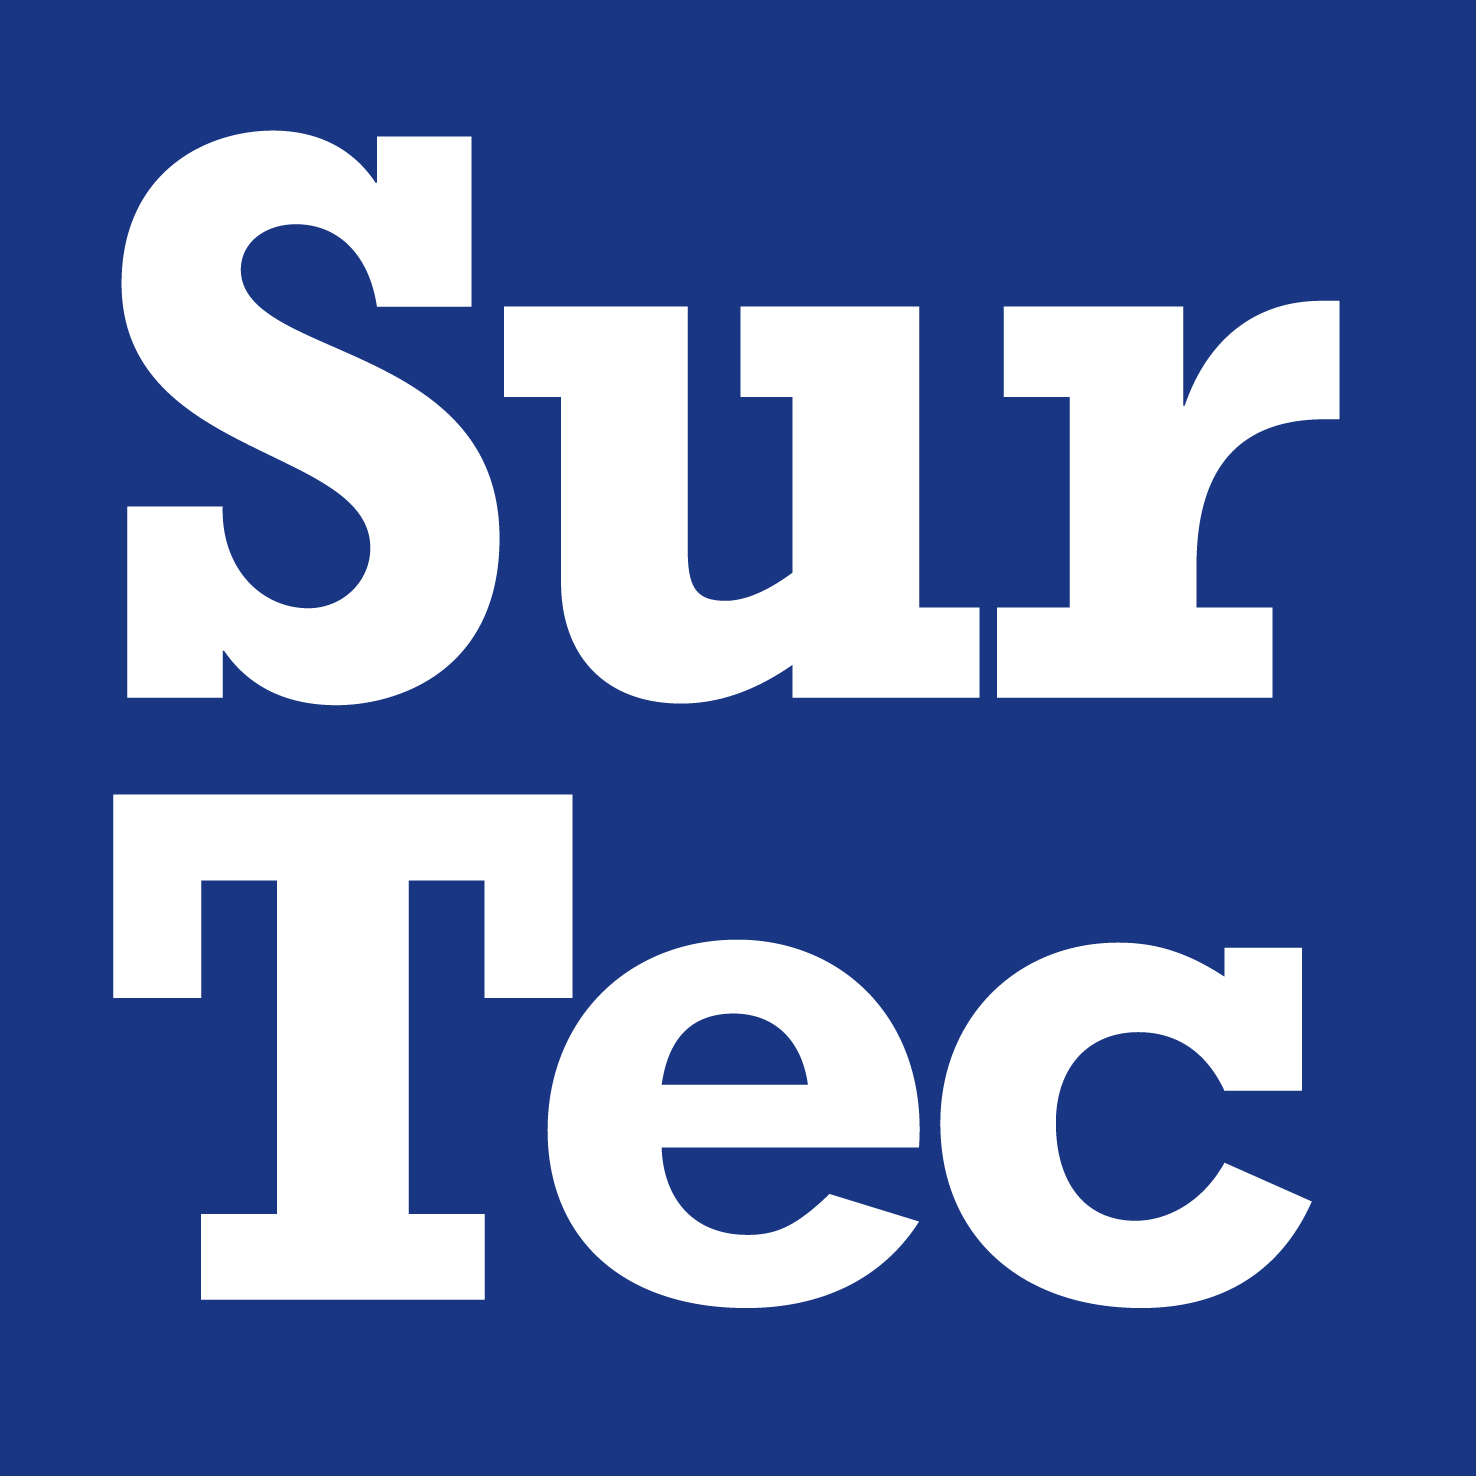 logo surtec